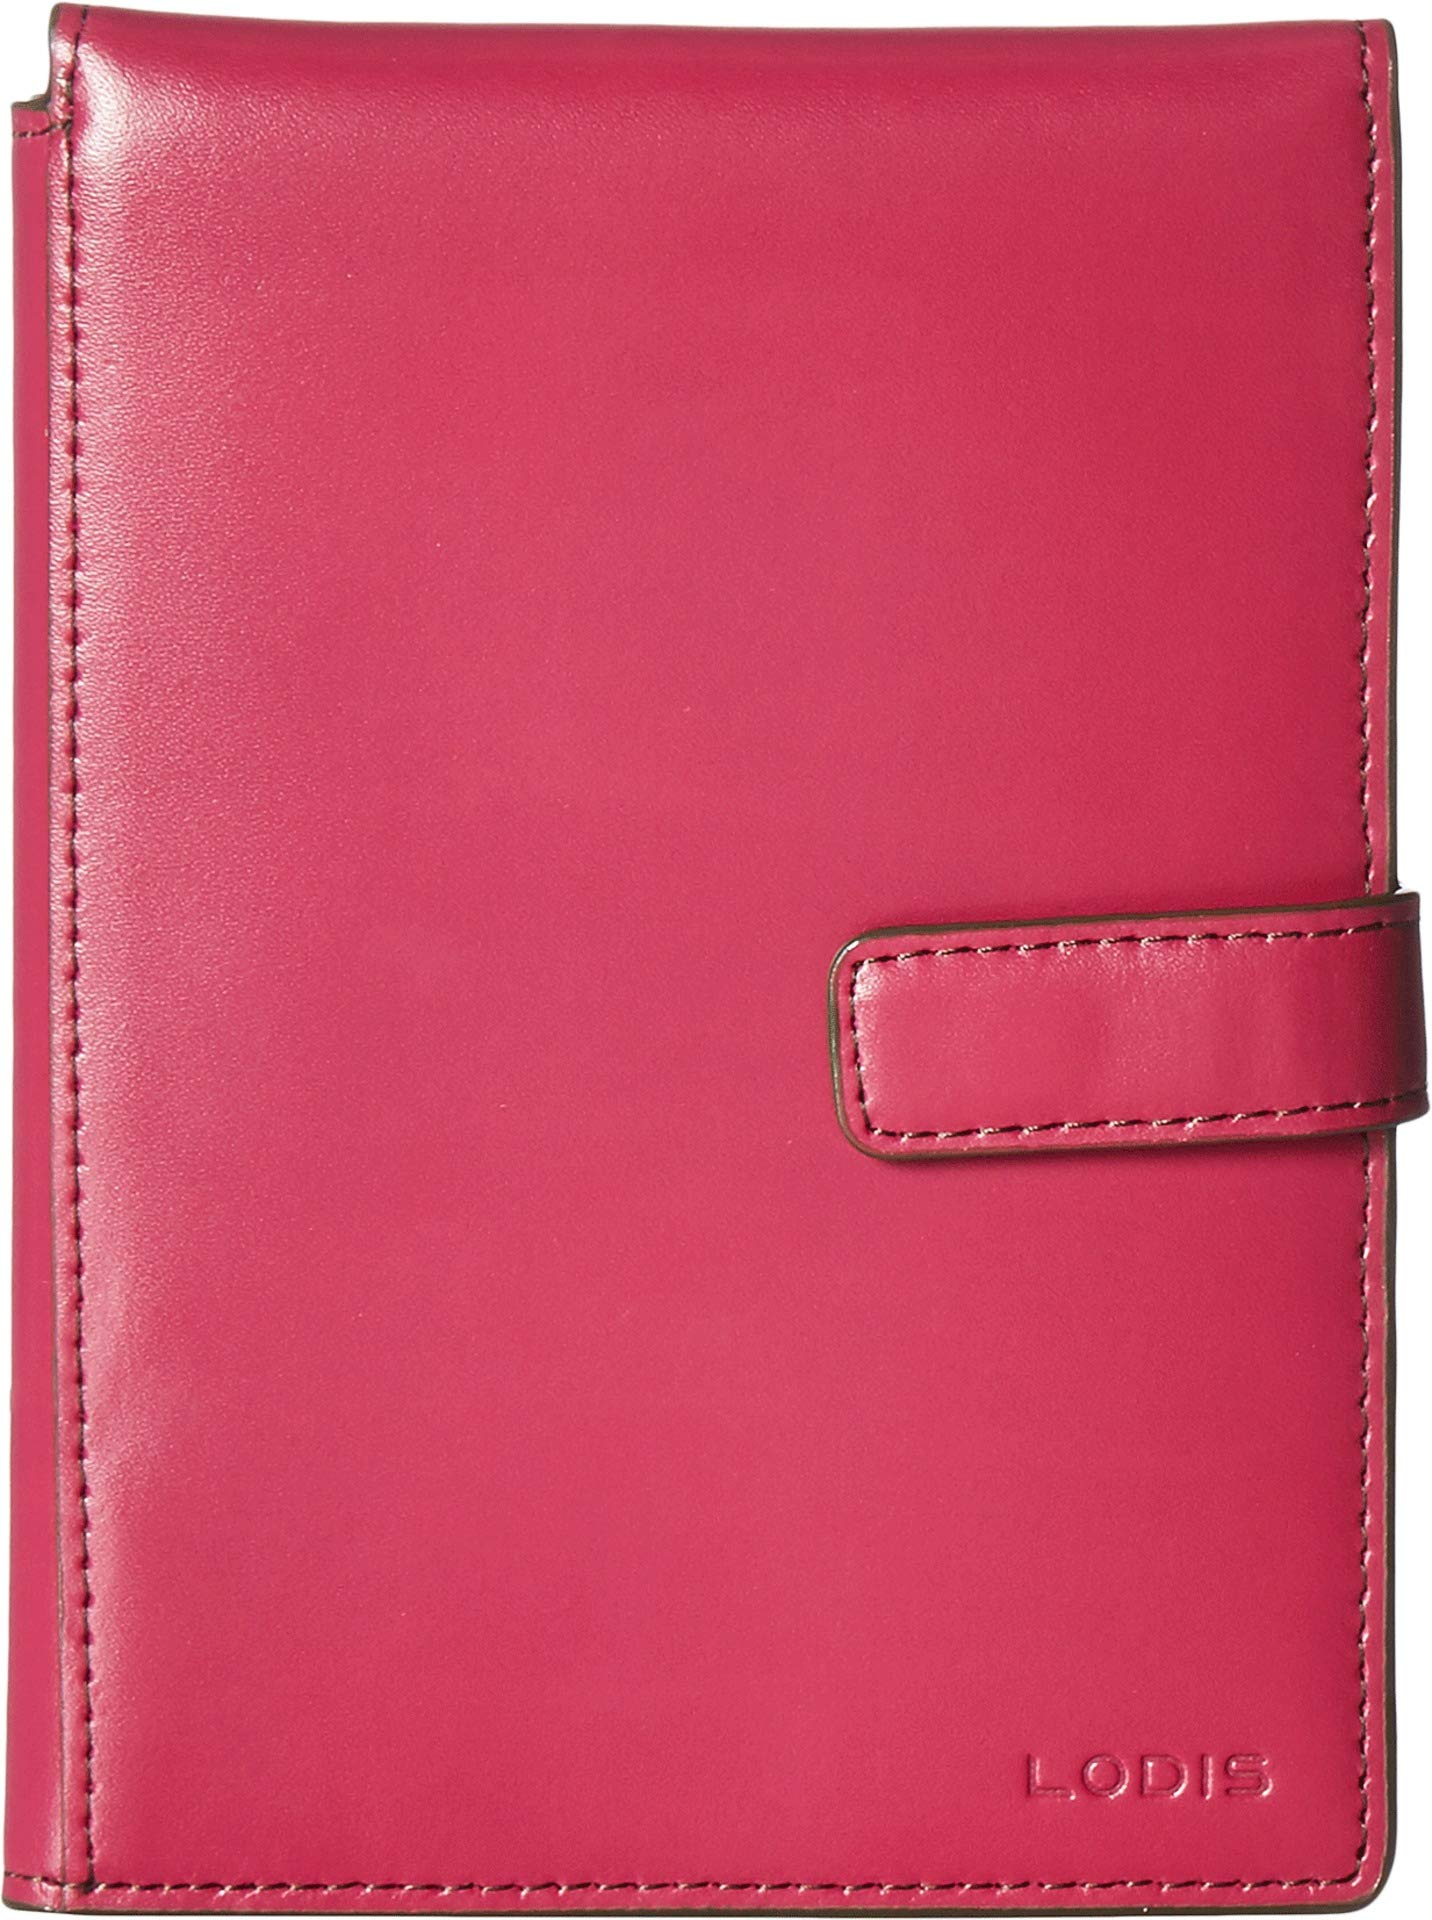 Lodis Accessories Women's Audrey Passport Wallet w/Ticket Flap Berry/Avocado One Size